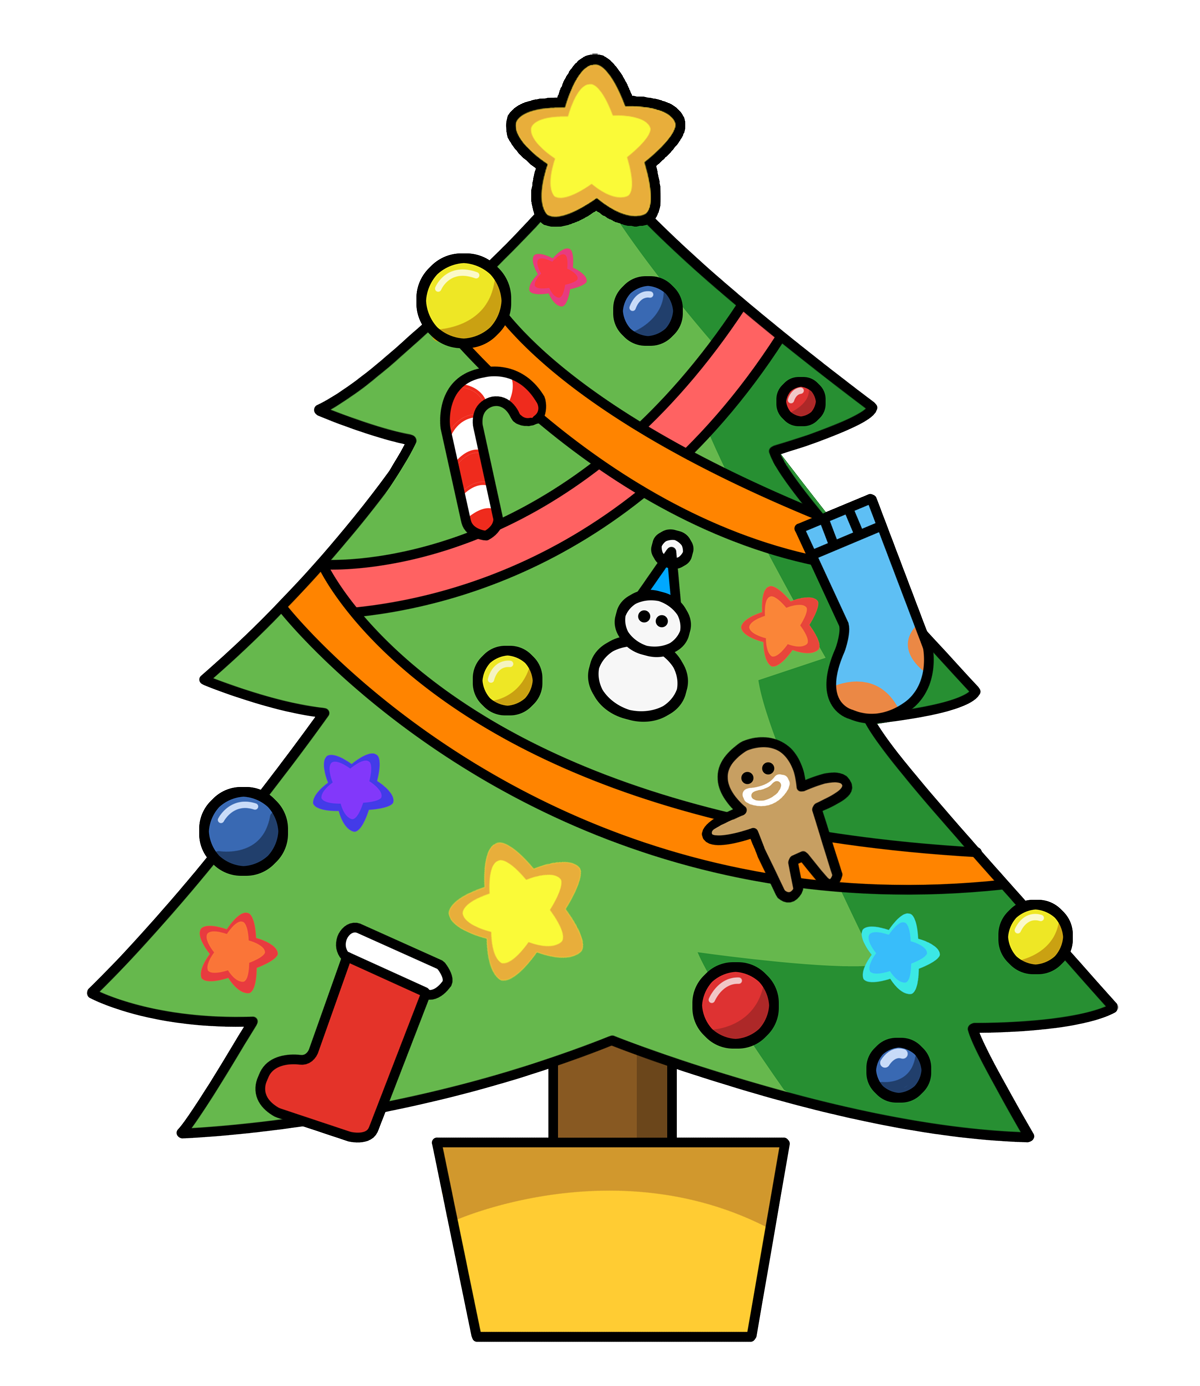 Diversity tree clipart graphic free stock Club Mod: Christmas Fun at UTK graphic free stock